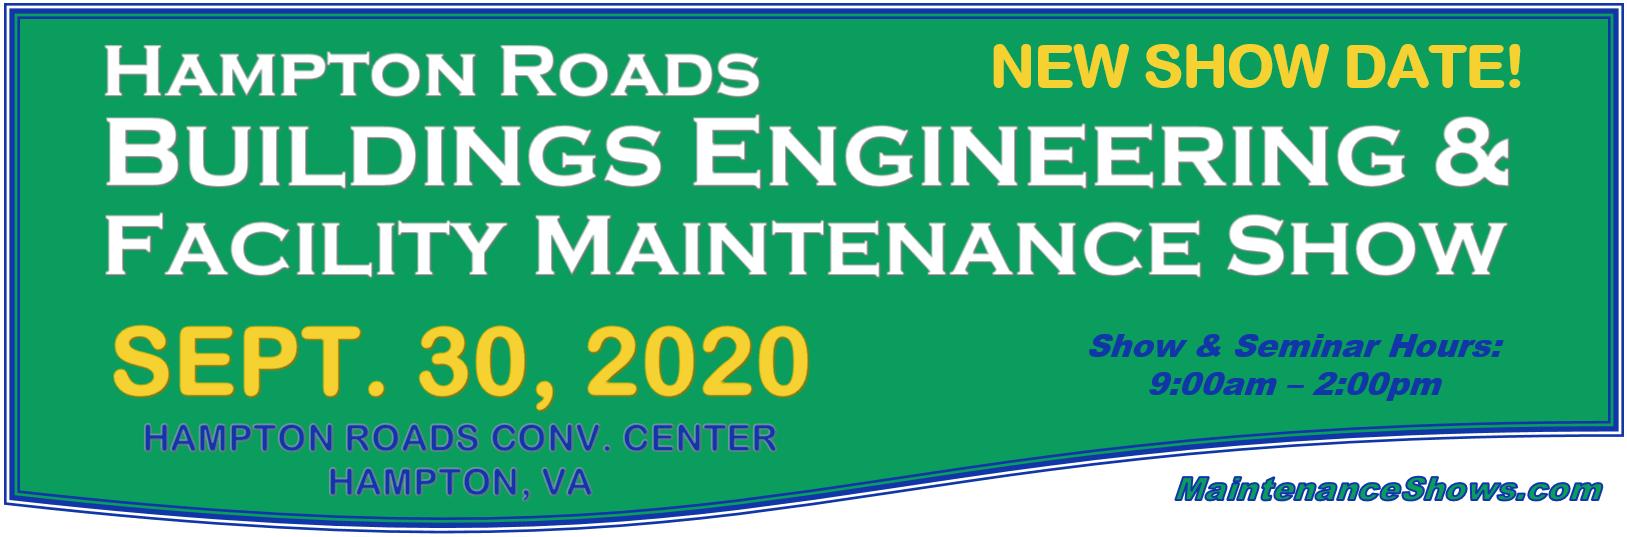 2020 Hampton Roads Buildings Engineering & Facility